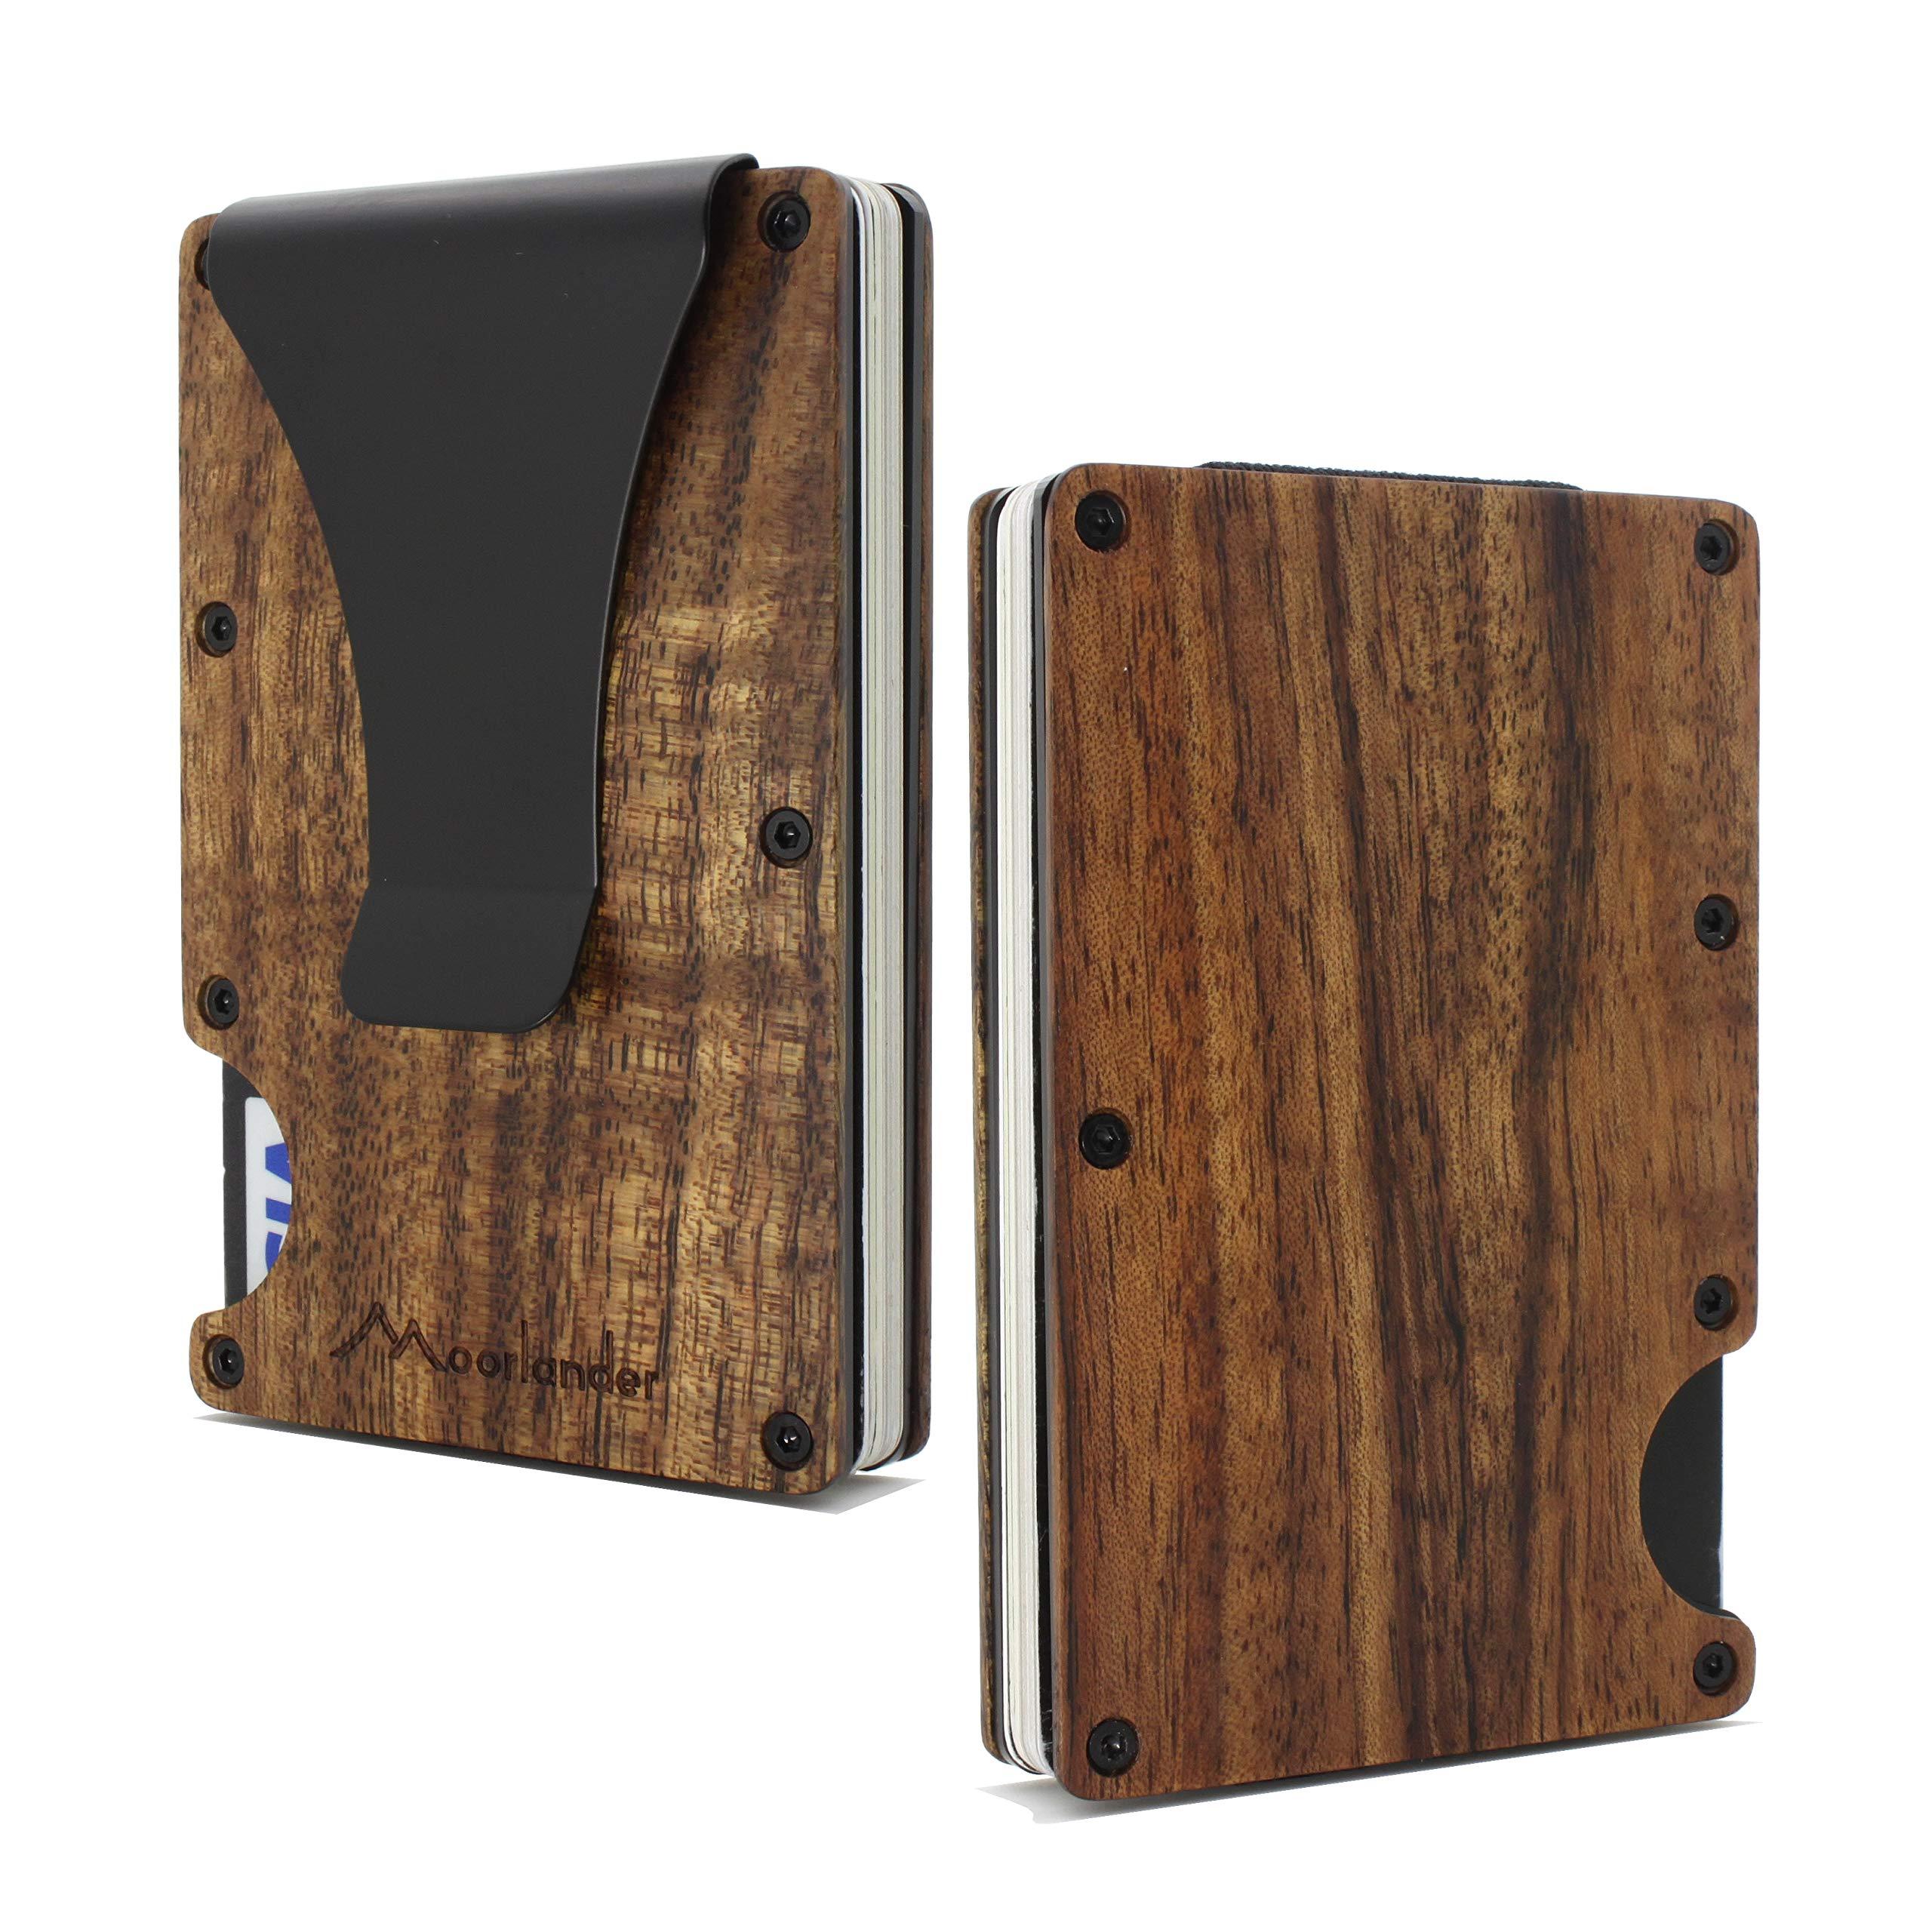 Acacia Koa Wood Credit Card Holder Wooden Case Slim RFID Blocking Metal Wallet Money Cash Clip Collection Anti Scan by Yinuode